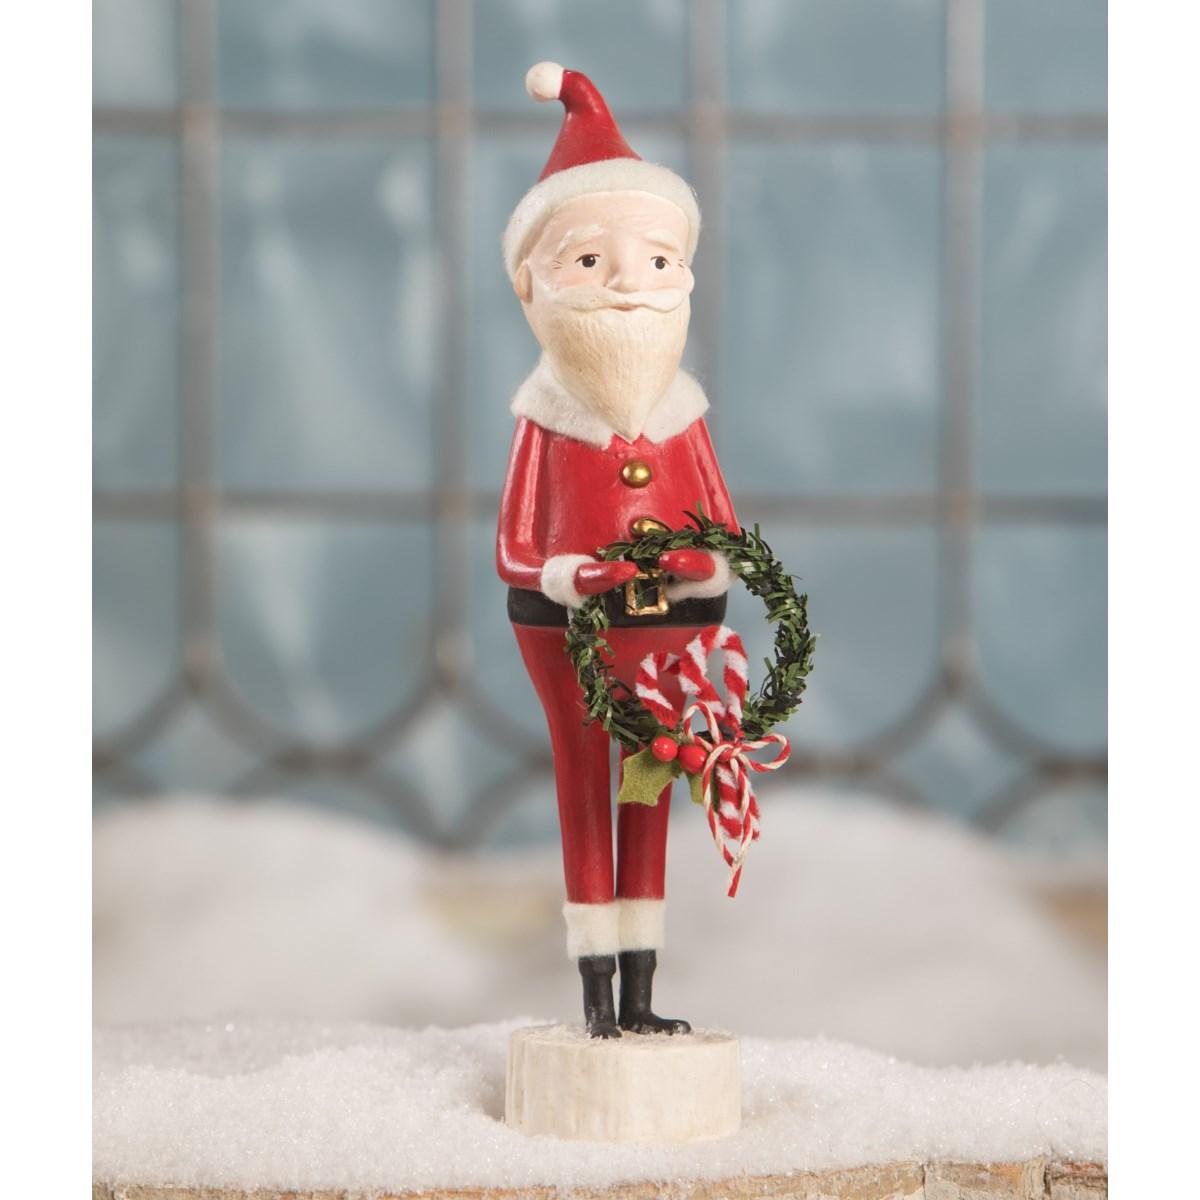 Candy Cane Santa With Wreath